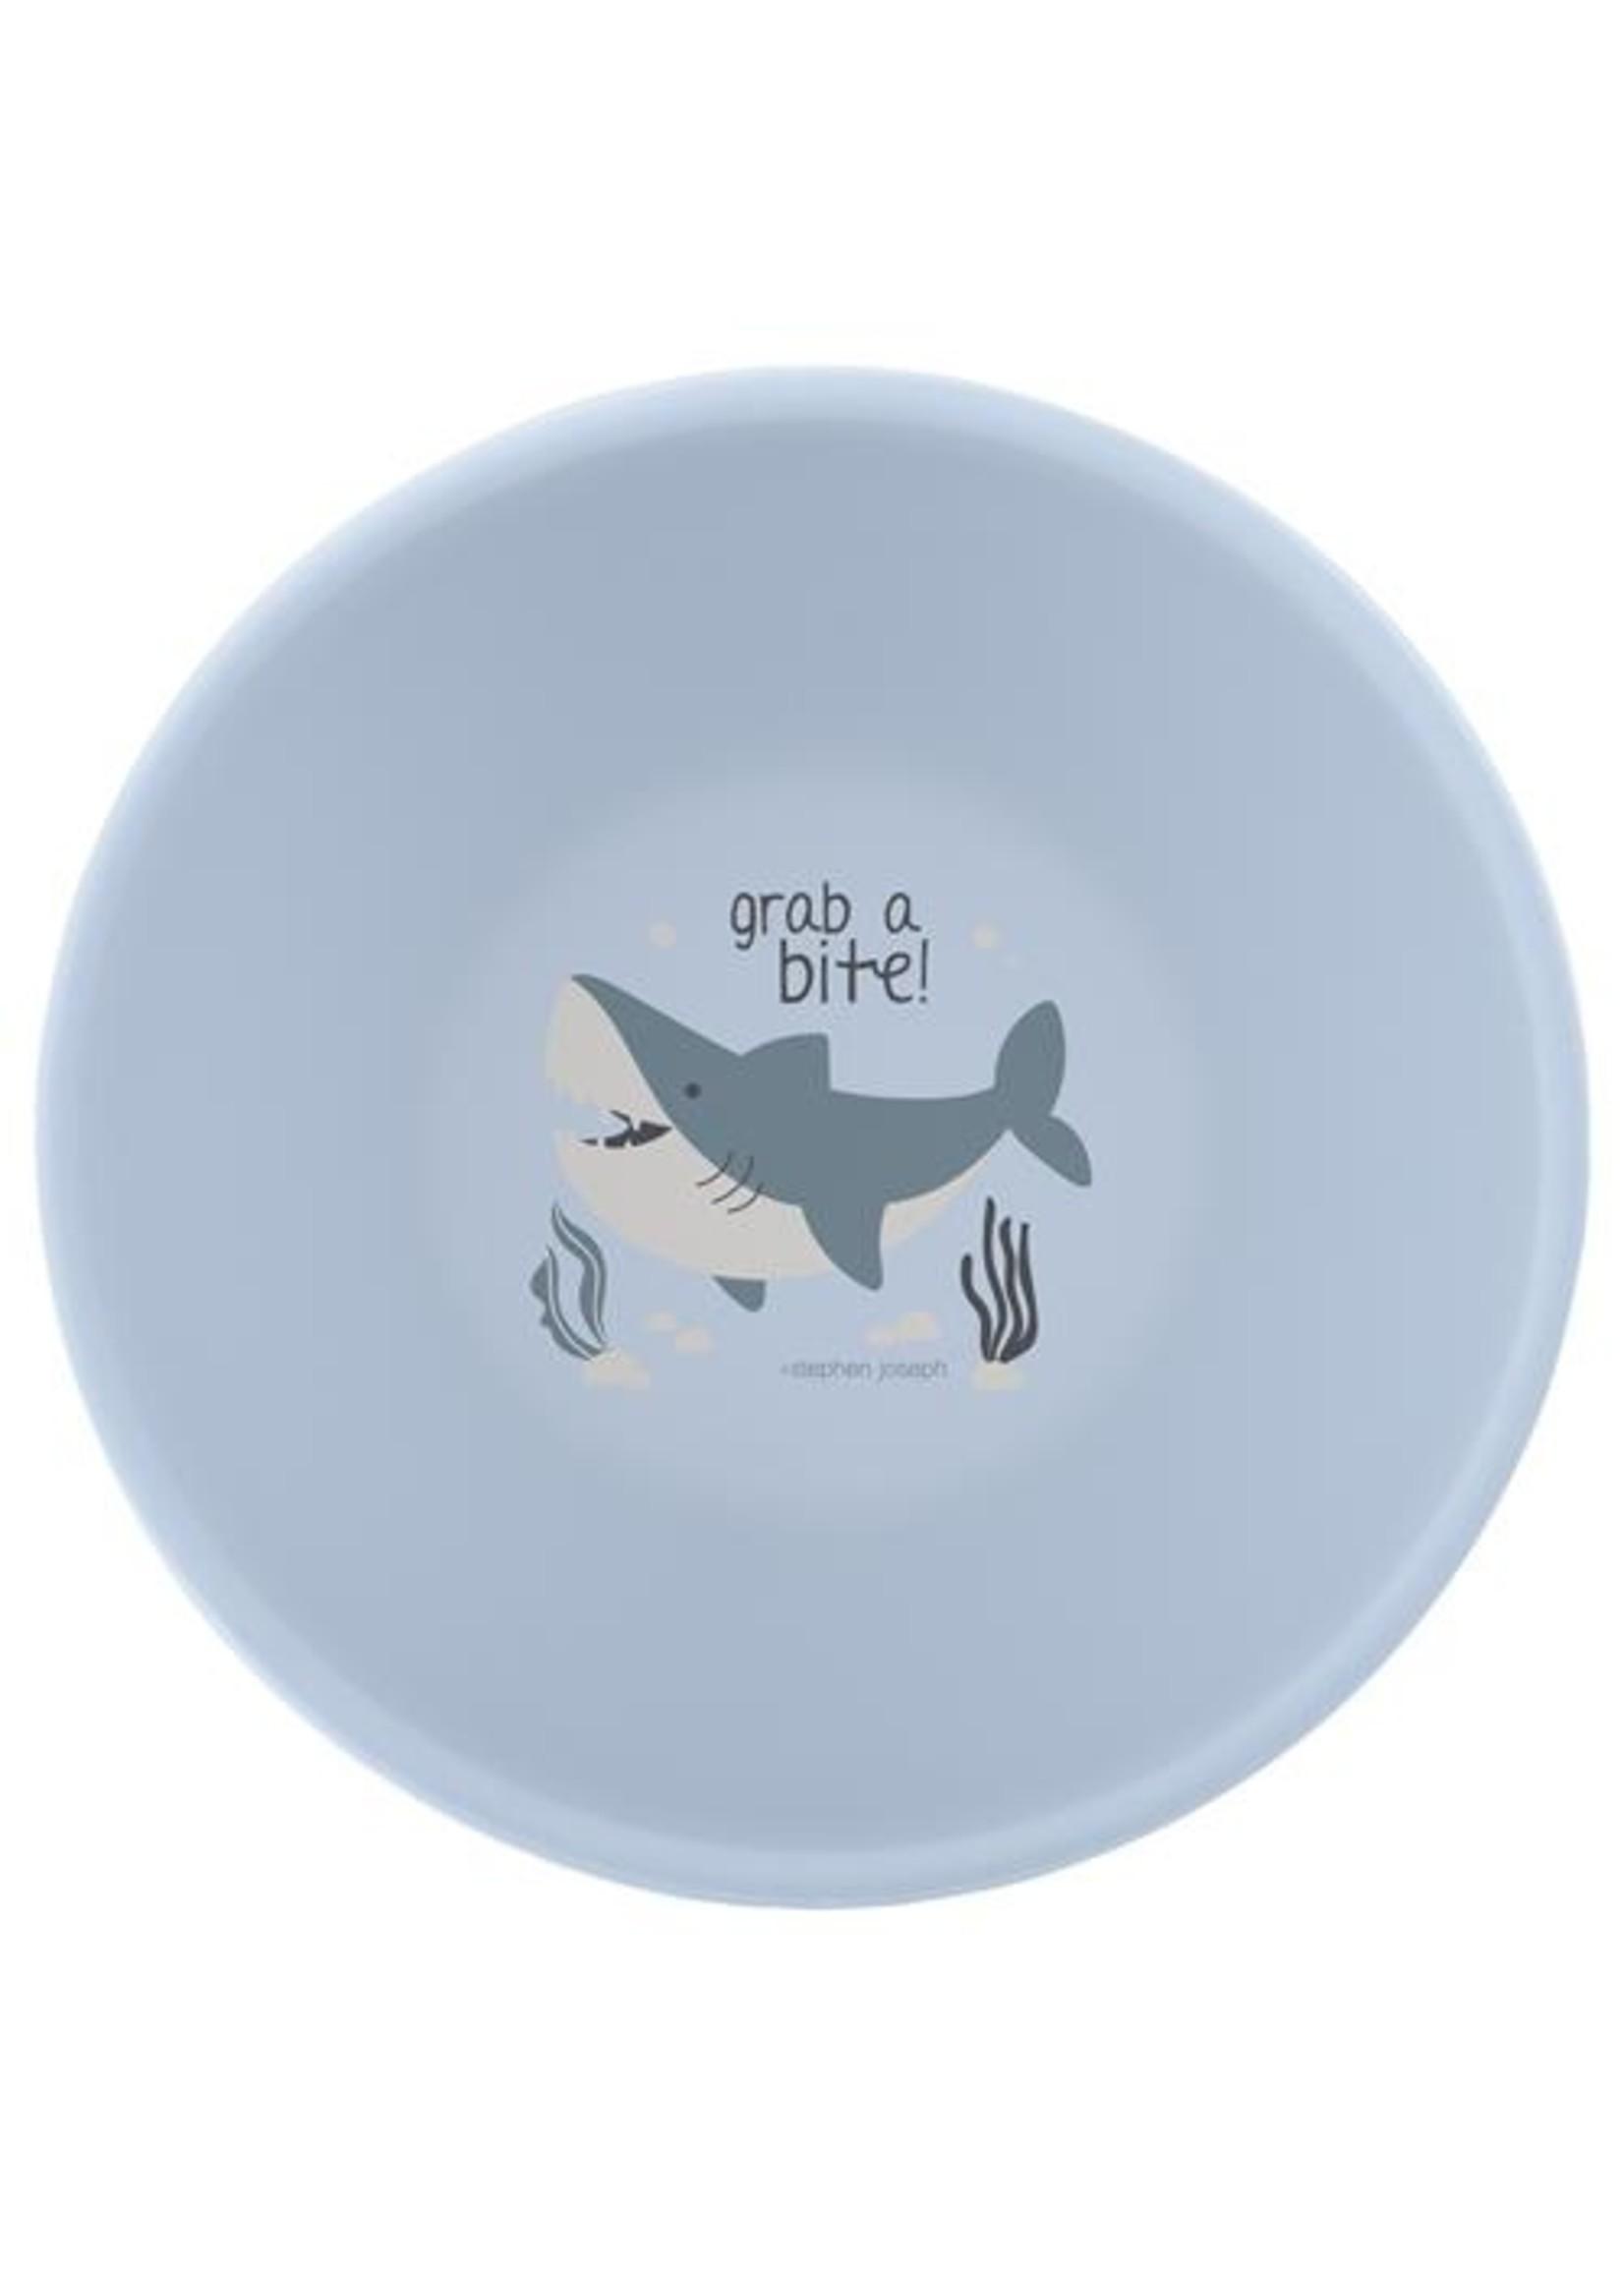 stephen joseph Silicone Bowl - Shark